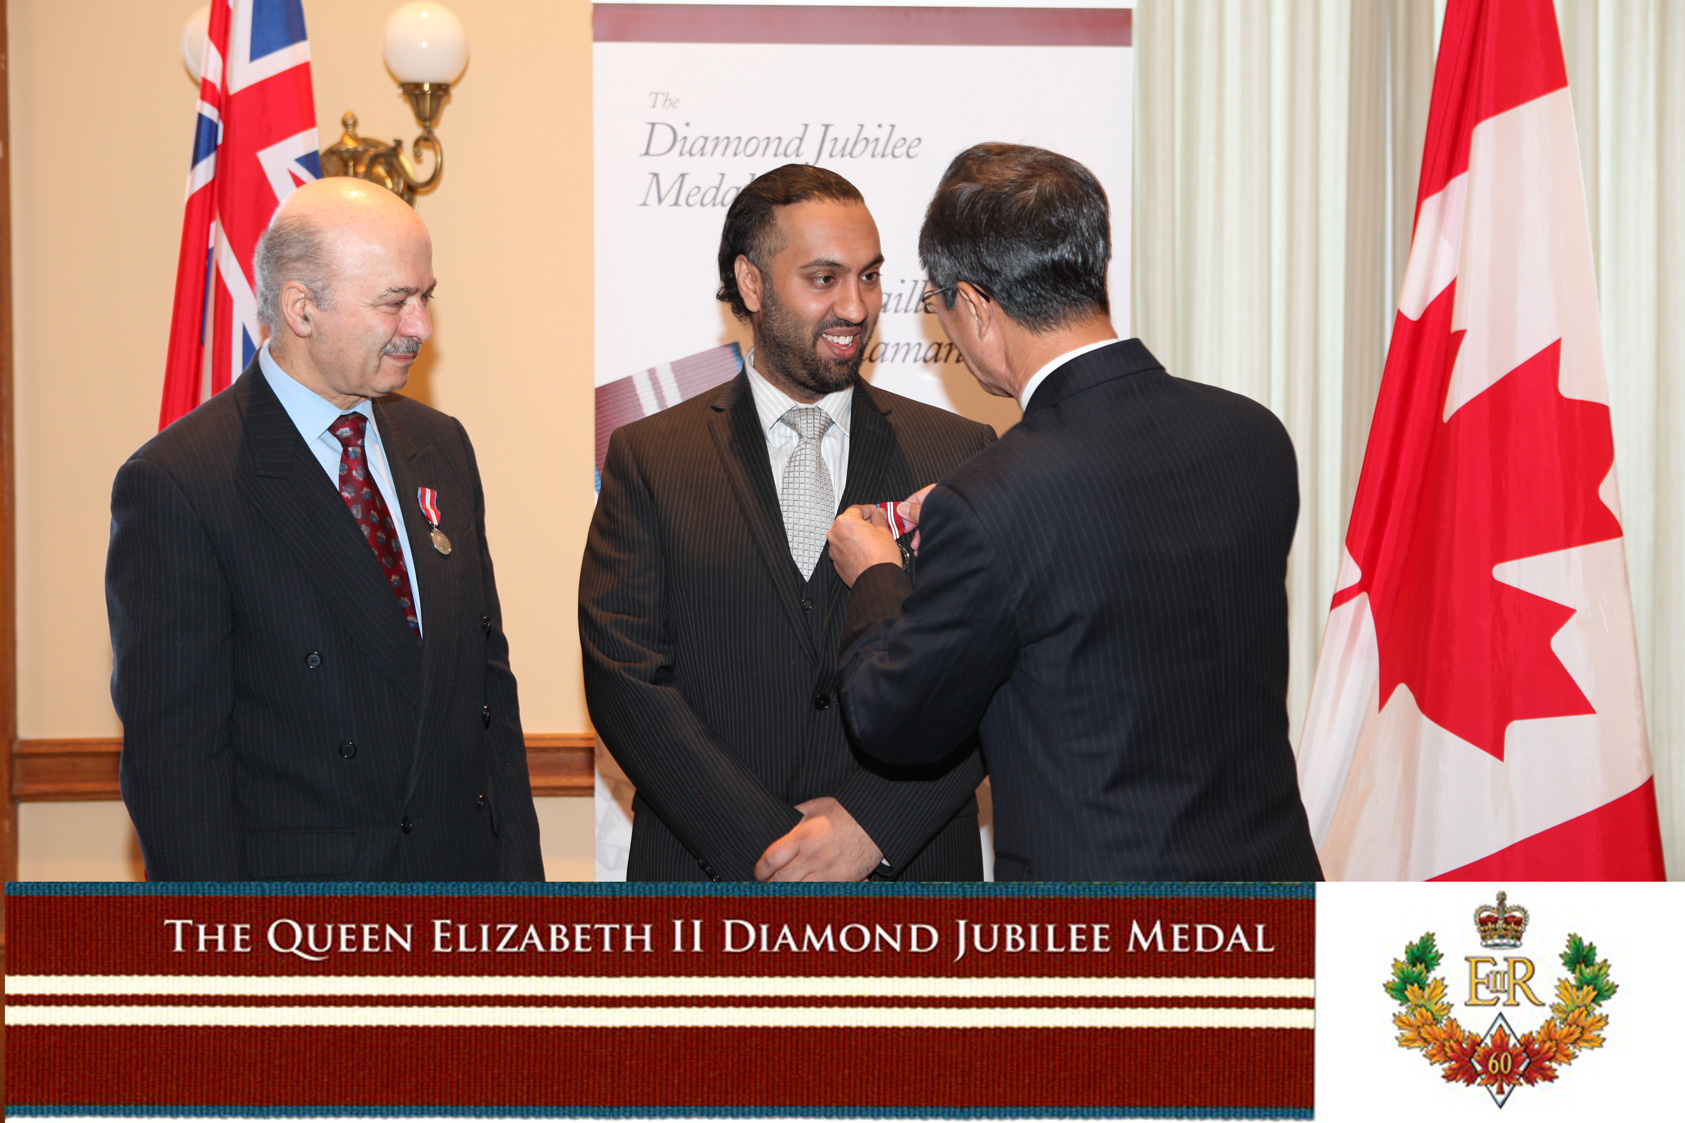 Omar-Ha-Redeye---Q-Elizabeth-II-Diamon-Jubilee-Medal